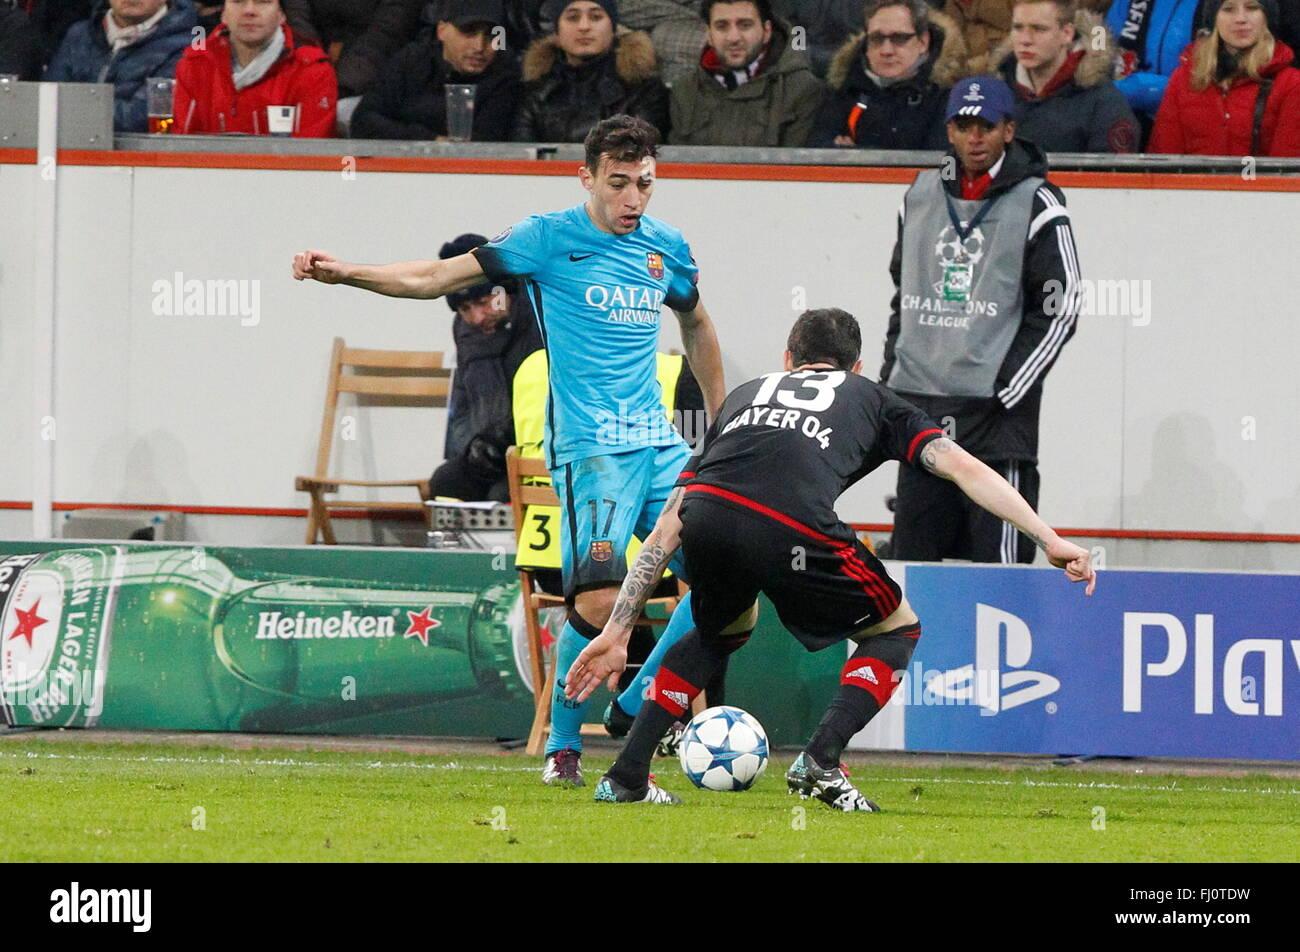 Munir el Haddadi during the champion league match Bayer Leverkusen - FC Barcelona December 9, 2015 in the Bay Arena,Leverkusen - Stock Image